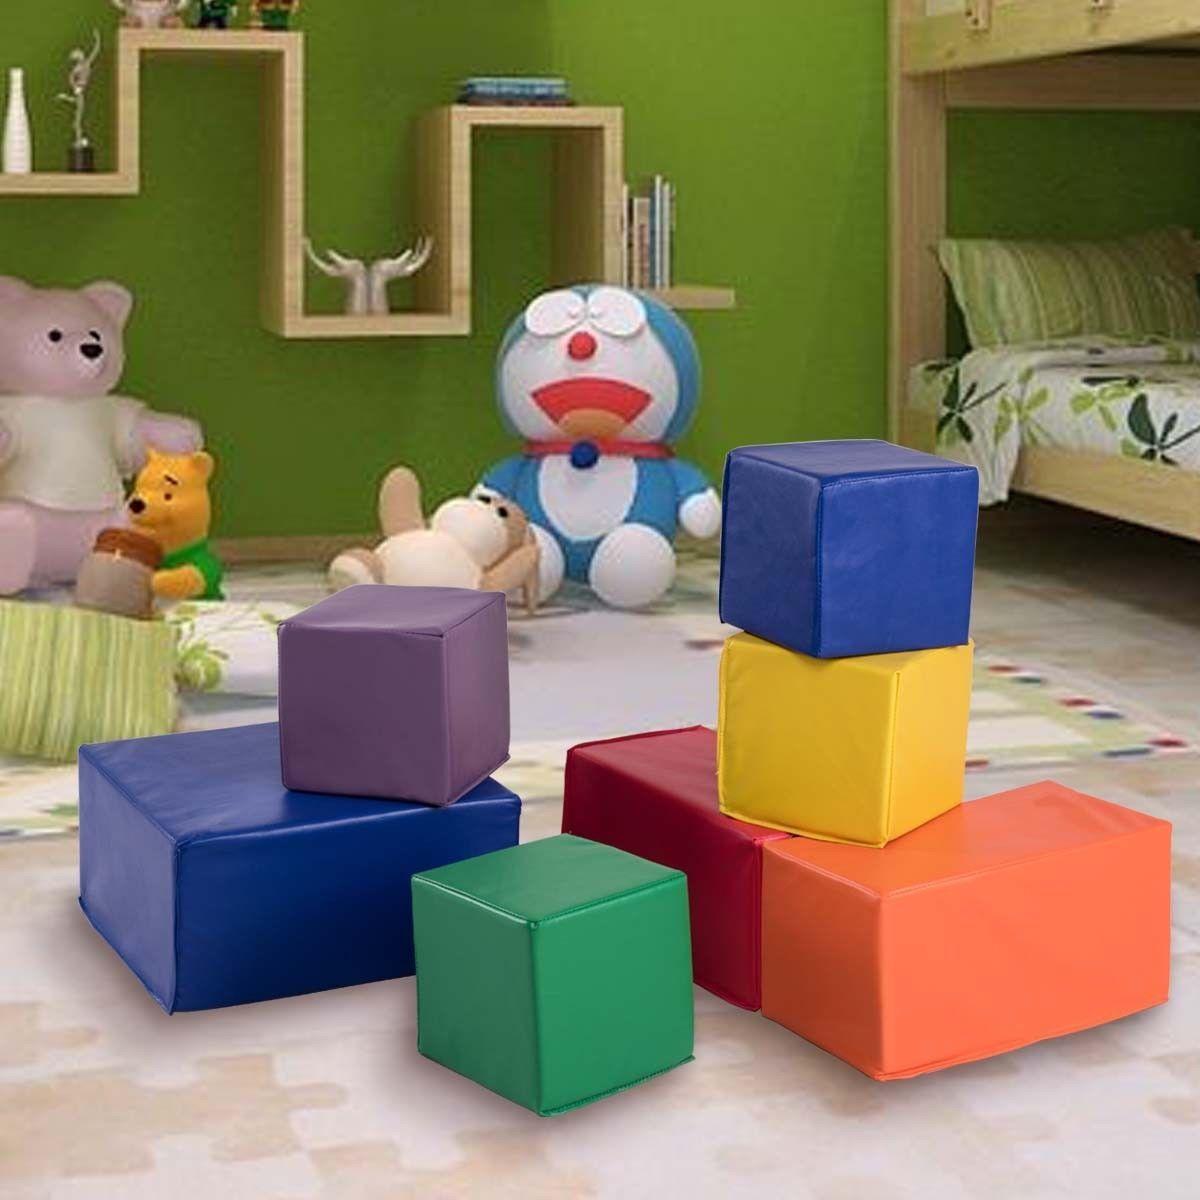 7PC Kinder PU Foam groß Building weich Blocks Mat Farbeful Play Room Fort haus Set